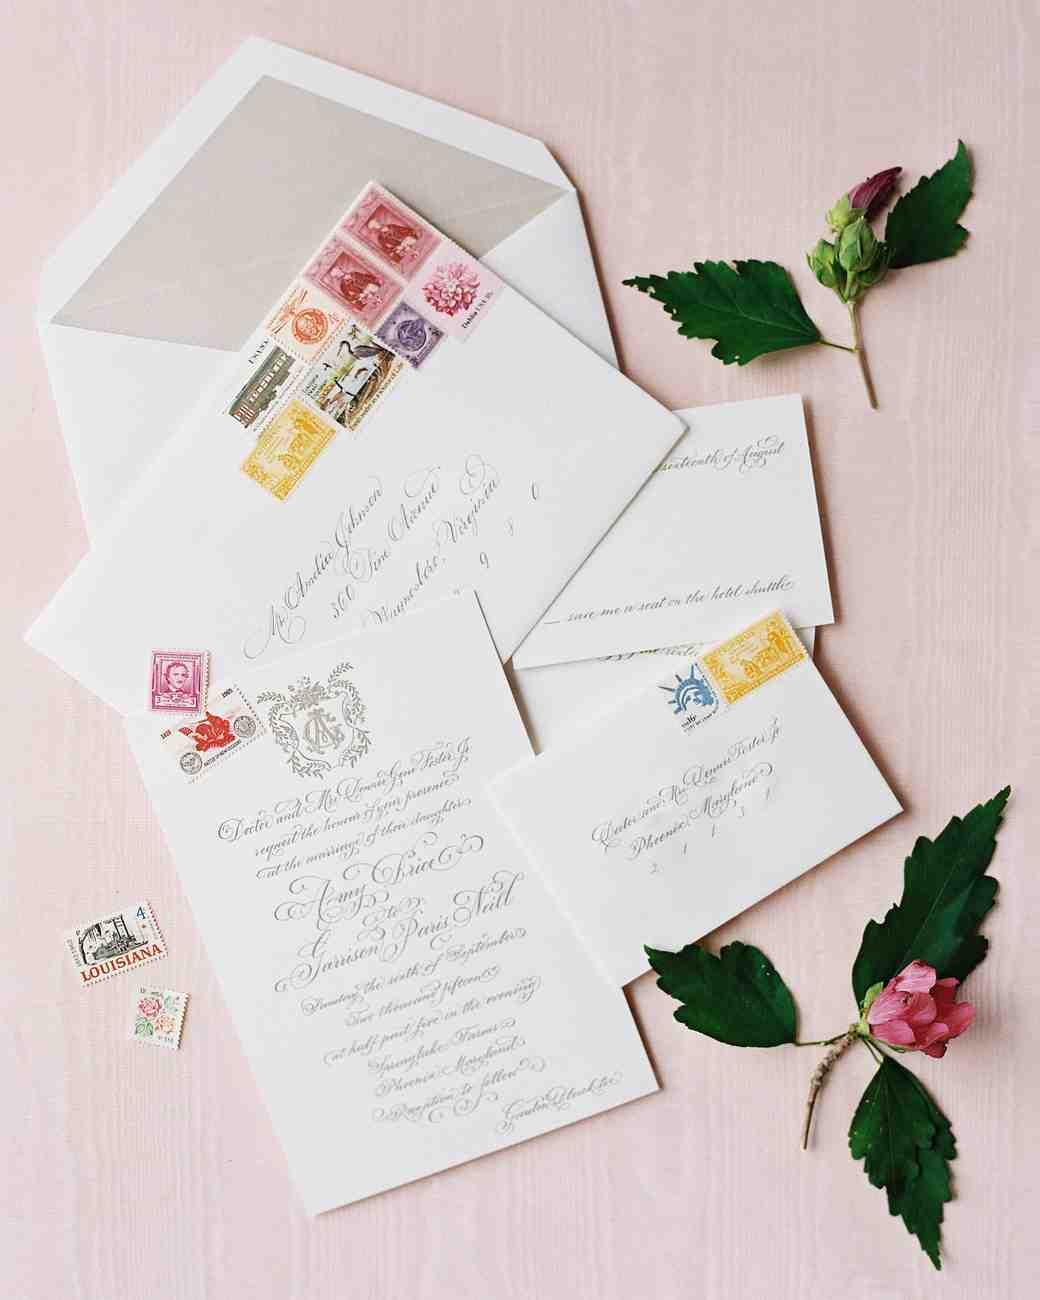 Wedding Invitations In Maryland: An Elegant Garden Wedding Near Baltimore